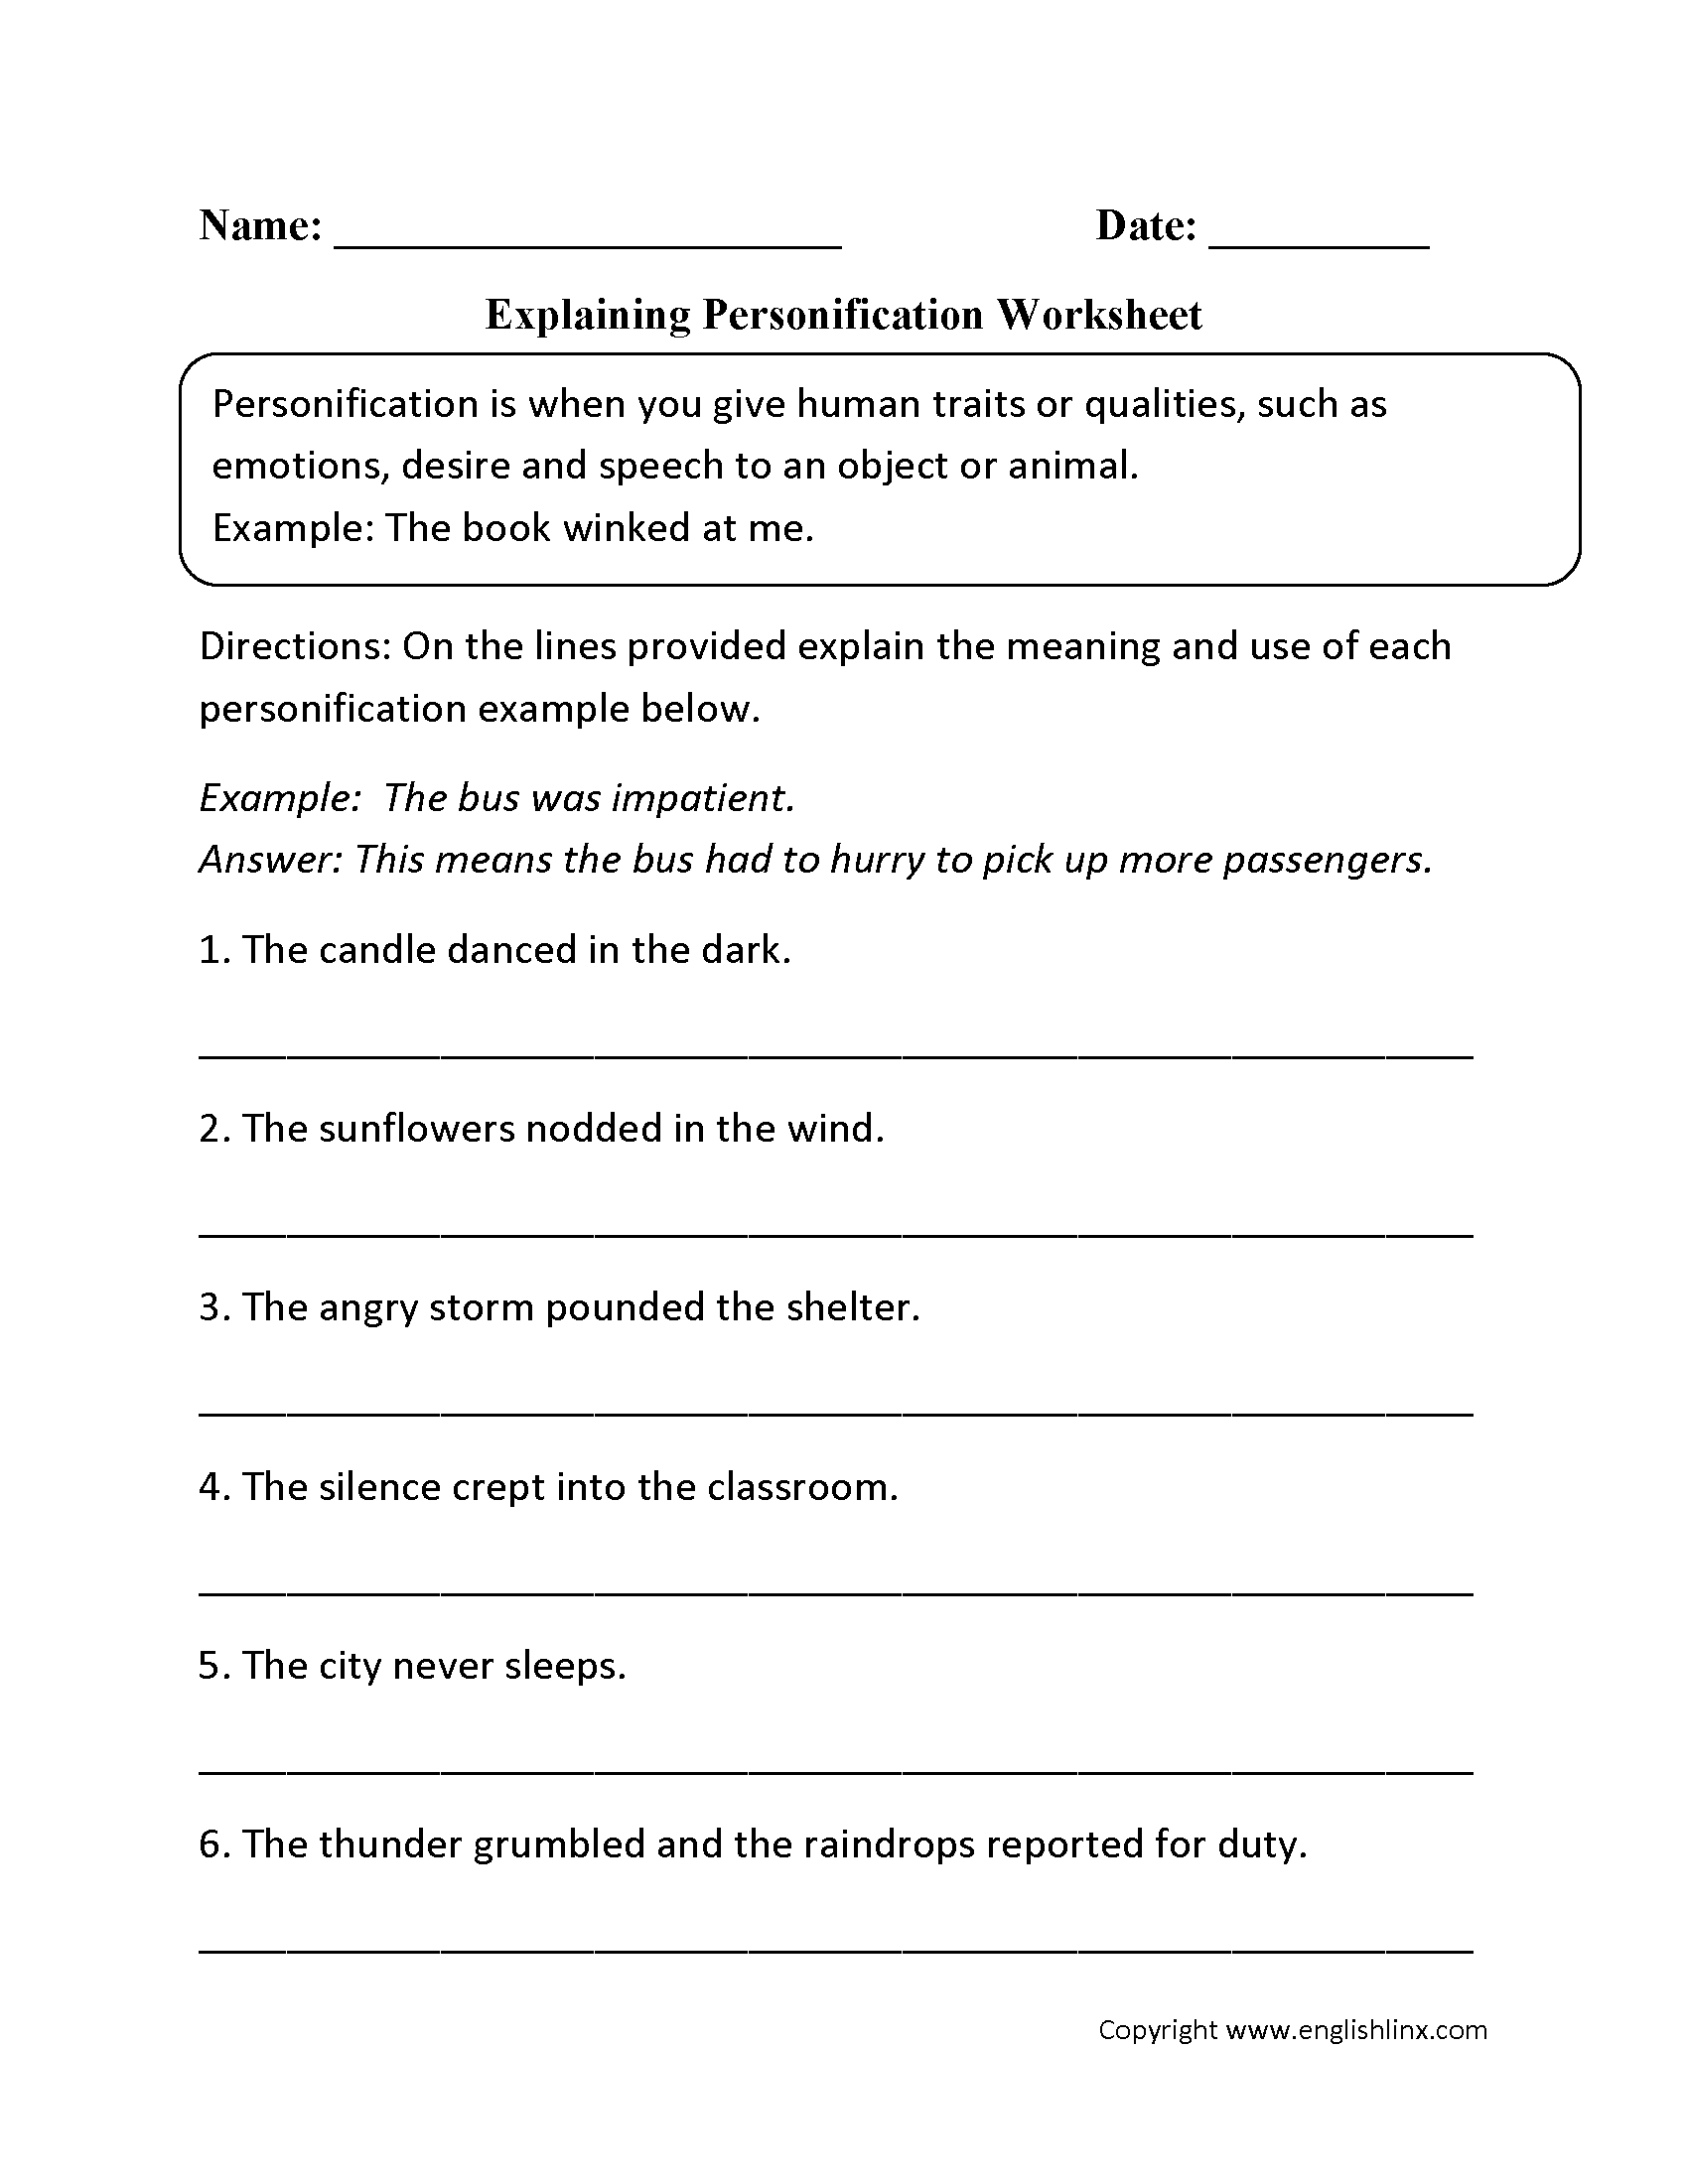 Explaining Personification Worksheet